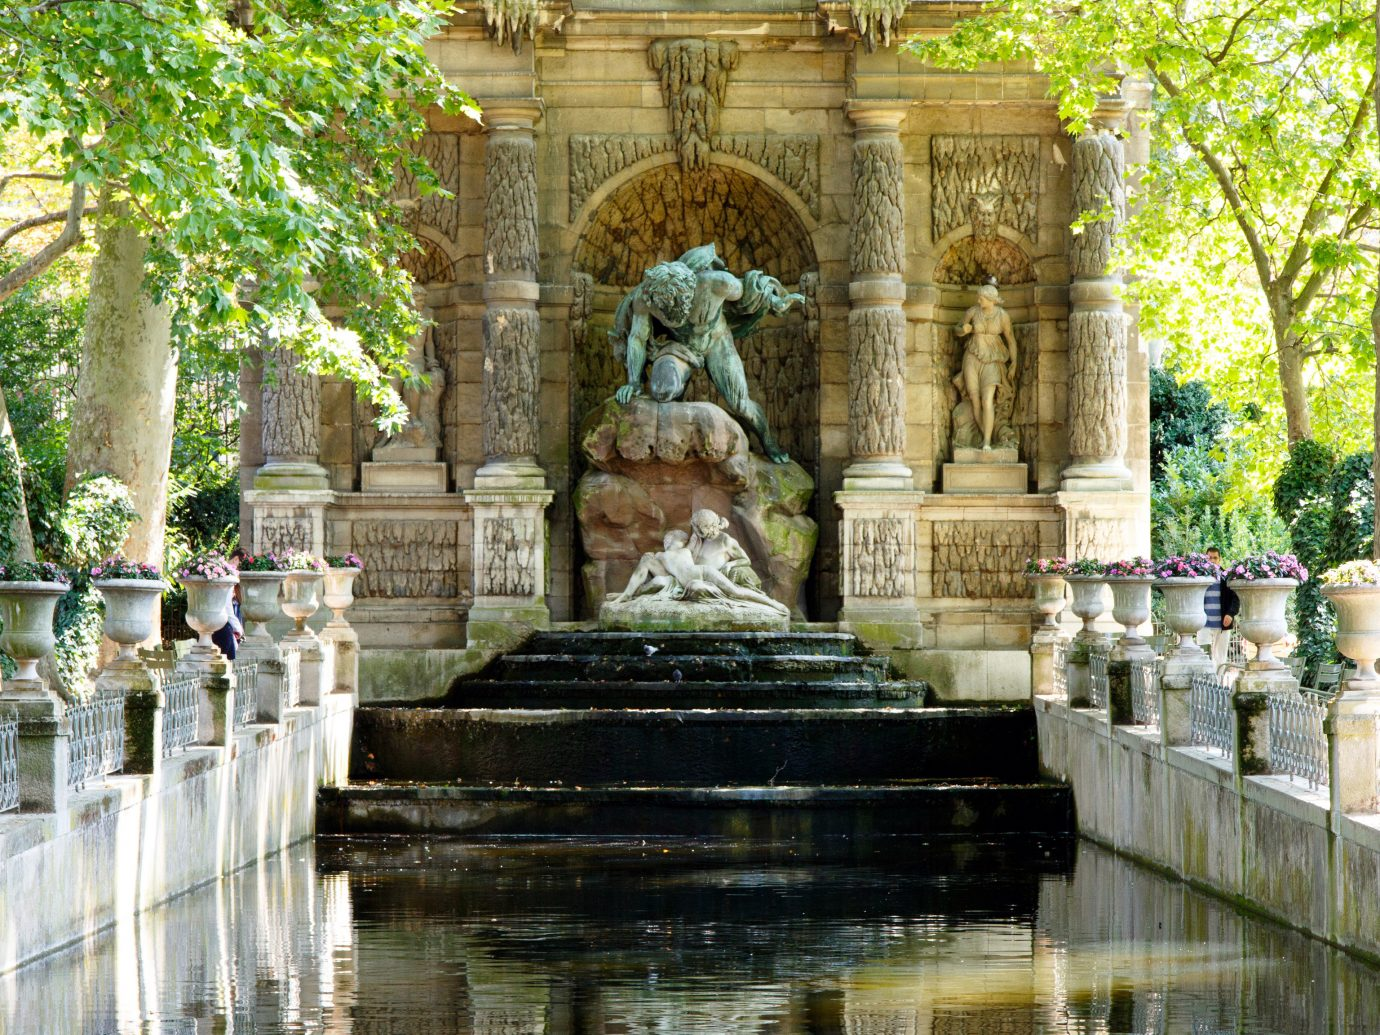 France Paris Trip Ideas landmark tourism temple water feature palace place of worship estate fountain ancient history shrine monument Garden altar colonnade